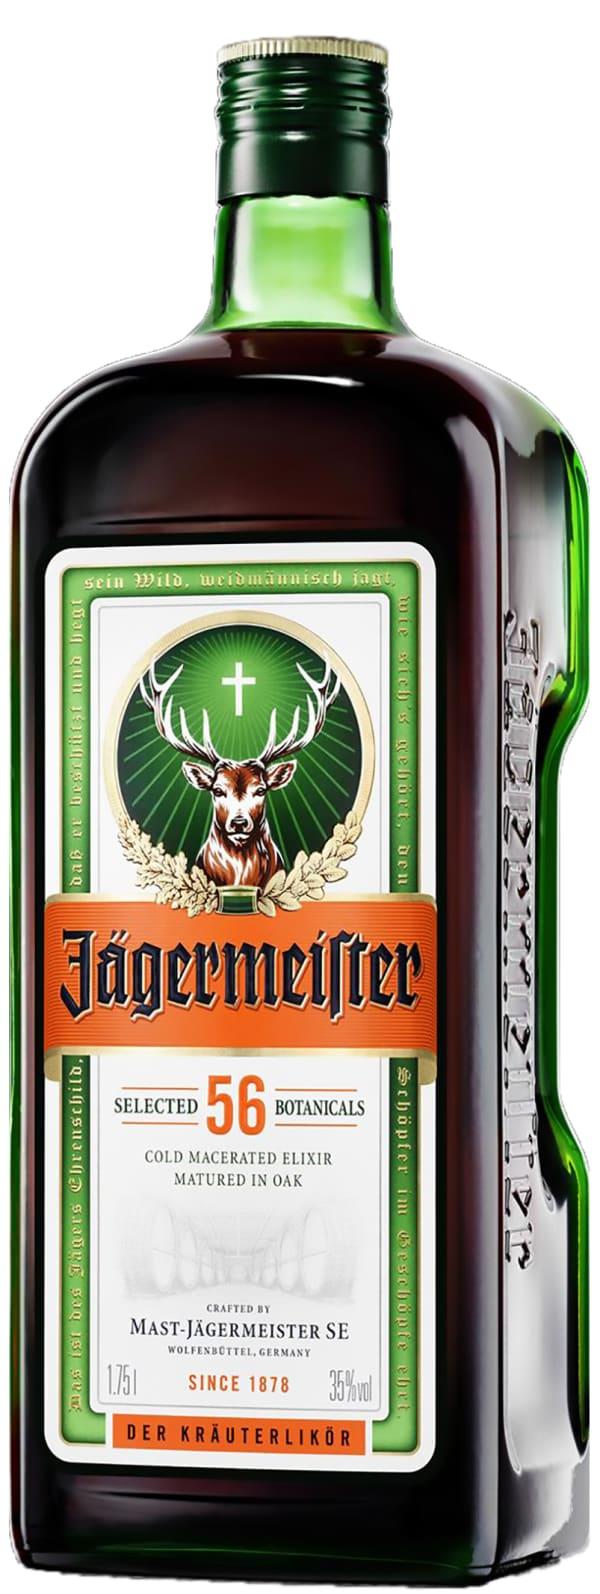 Jägermeister (1.75 l) - yrttiliköörit - Saksa - 131158 - Viinikartta.fi